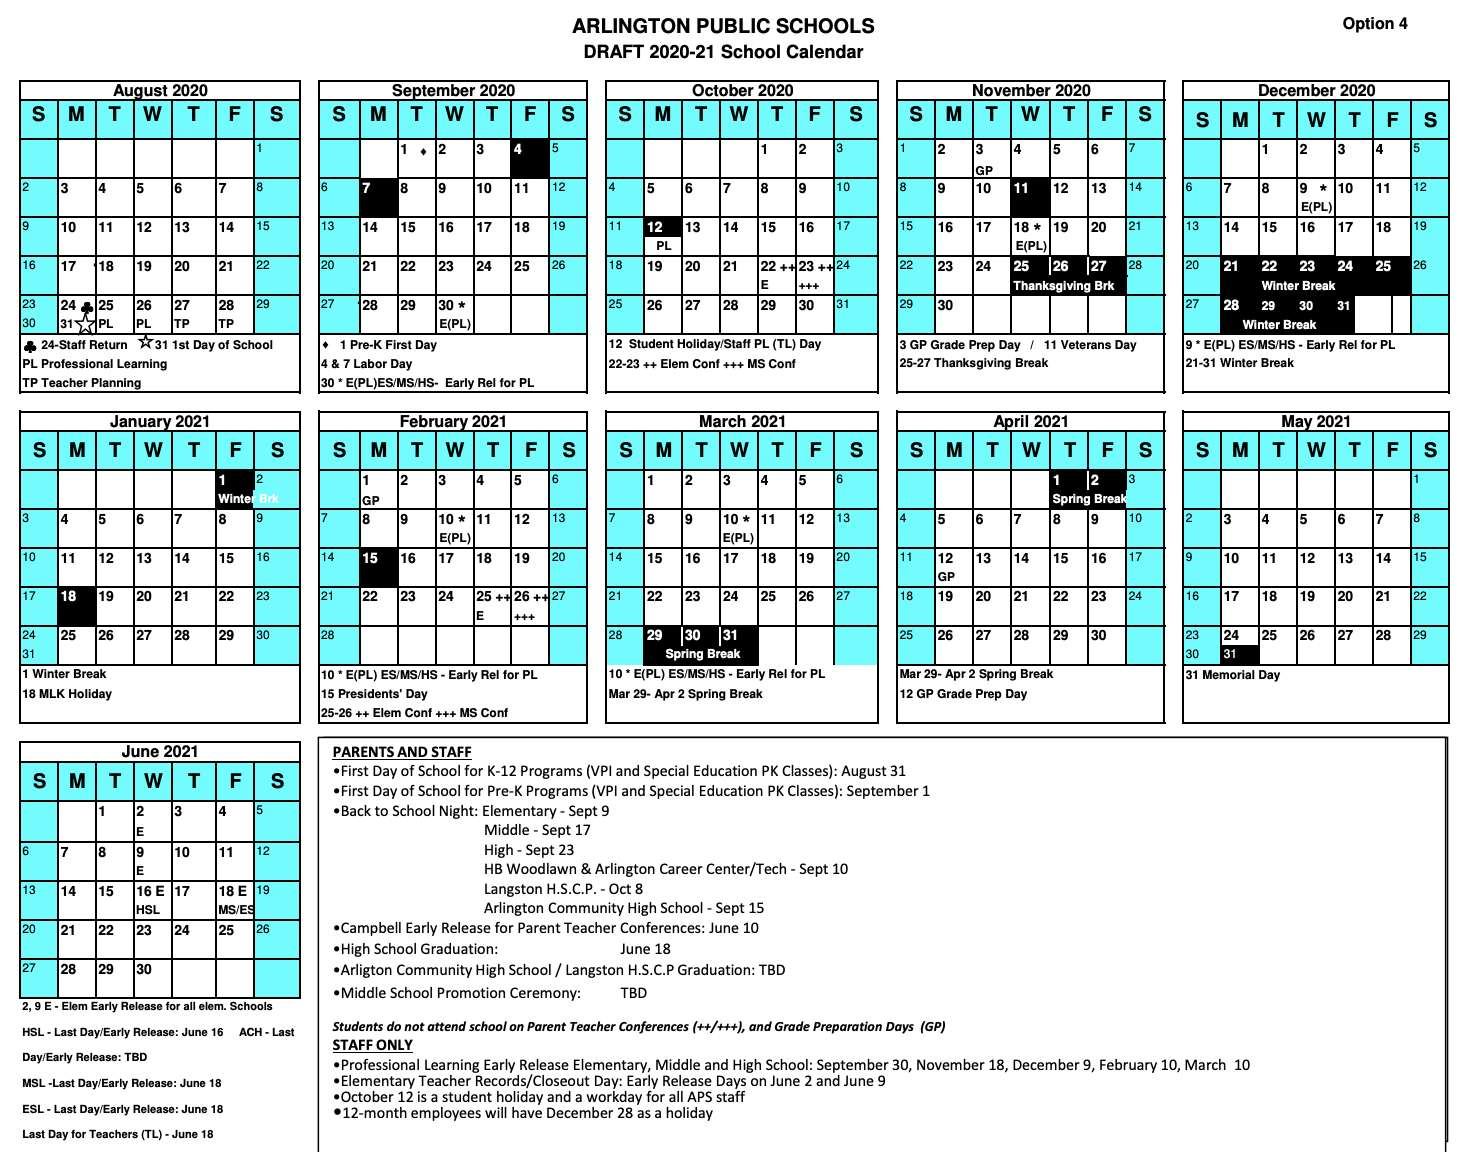 Aps School Year To Start Aug. 31 | Arlnow Throughout Post Falls High School Calendar